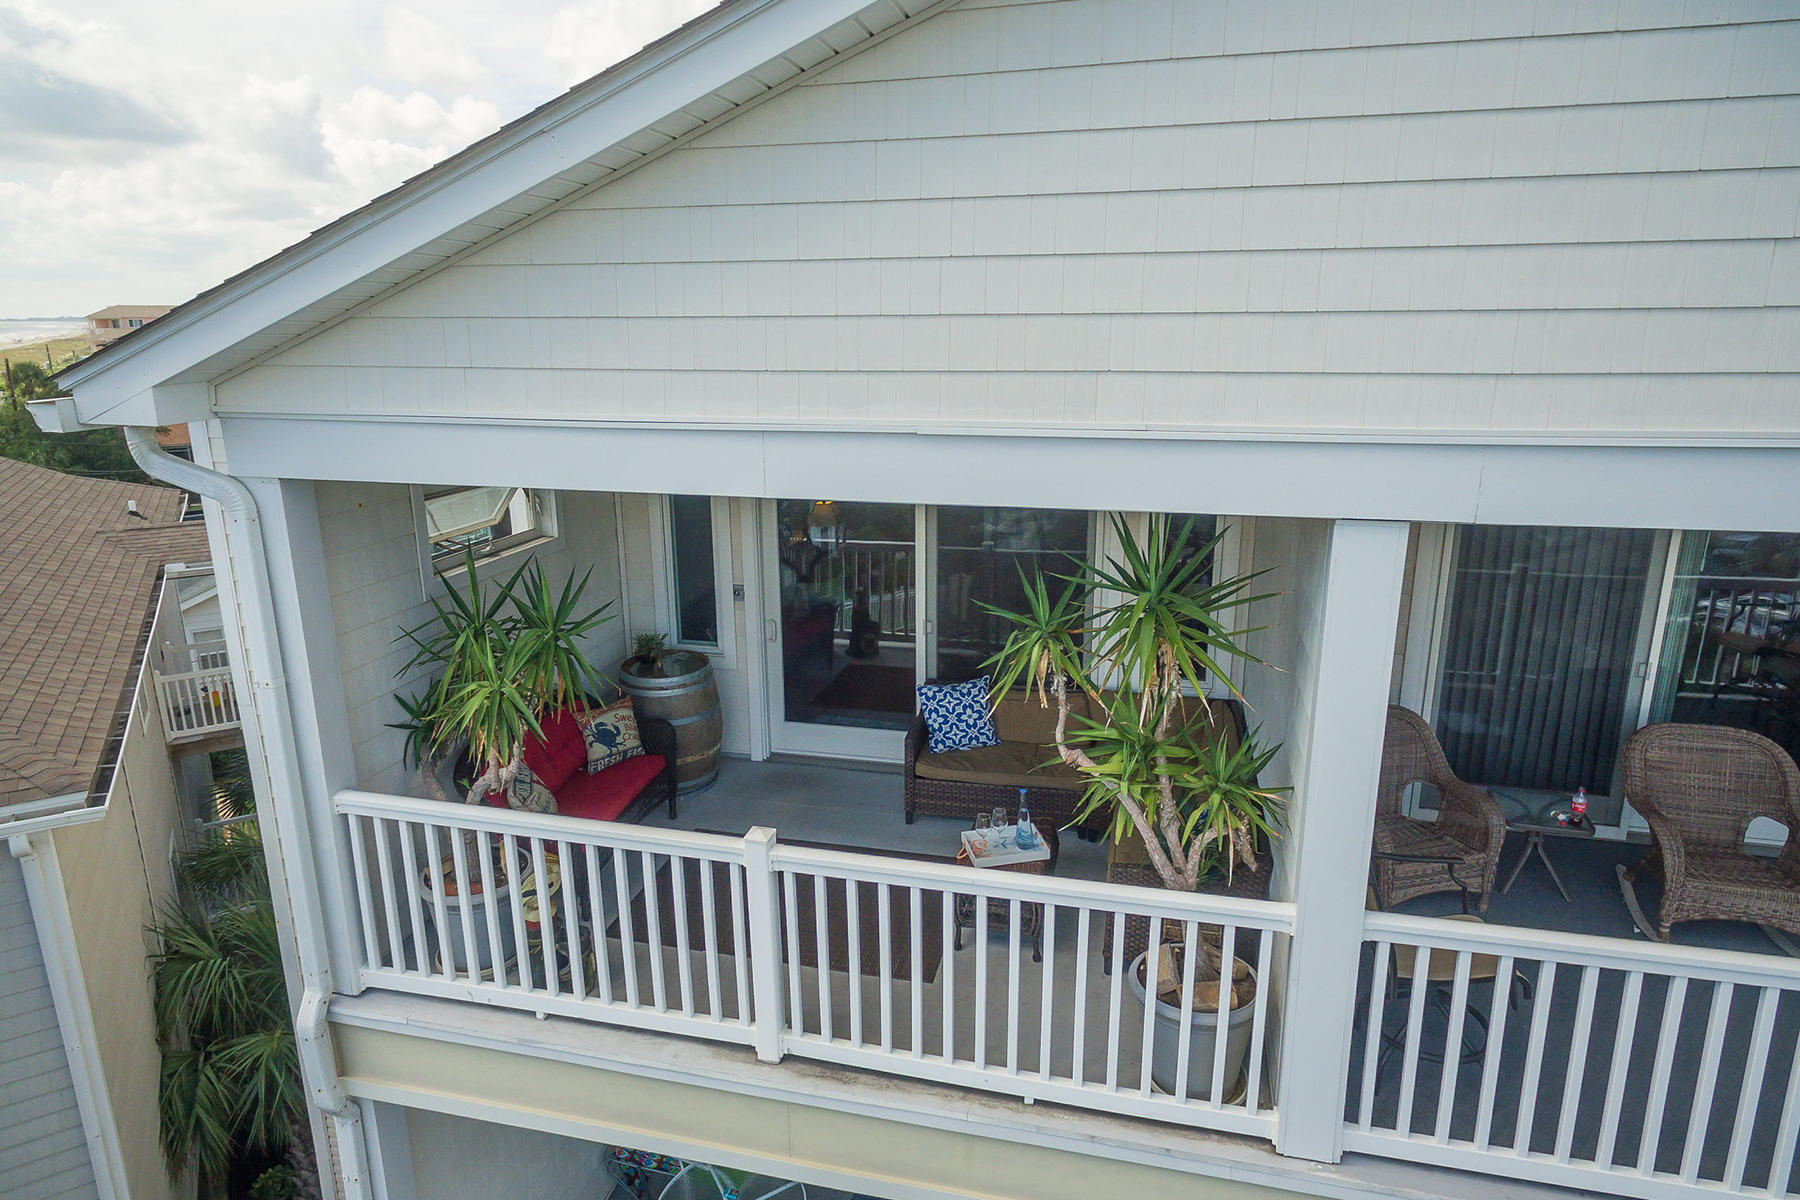 Pier Pointe Villas Homes For Sale - 114 Ashley, Folly Beach, SC - 23